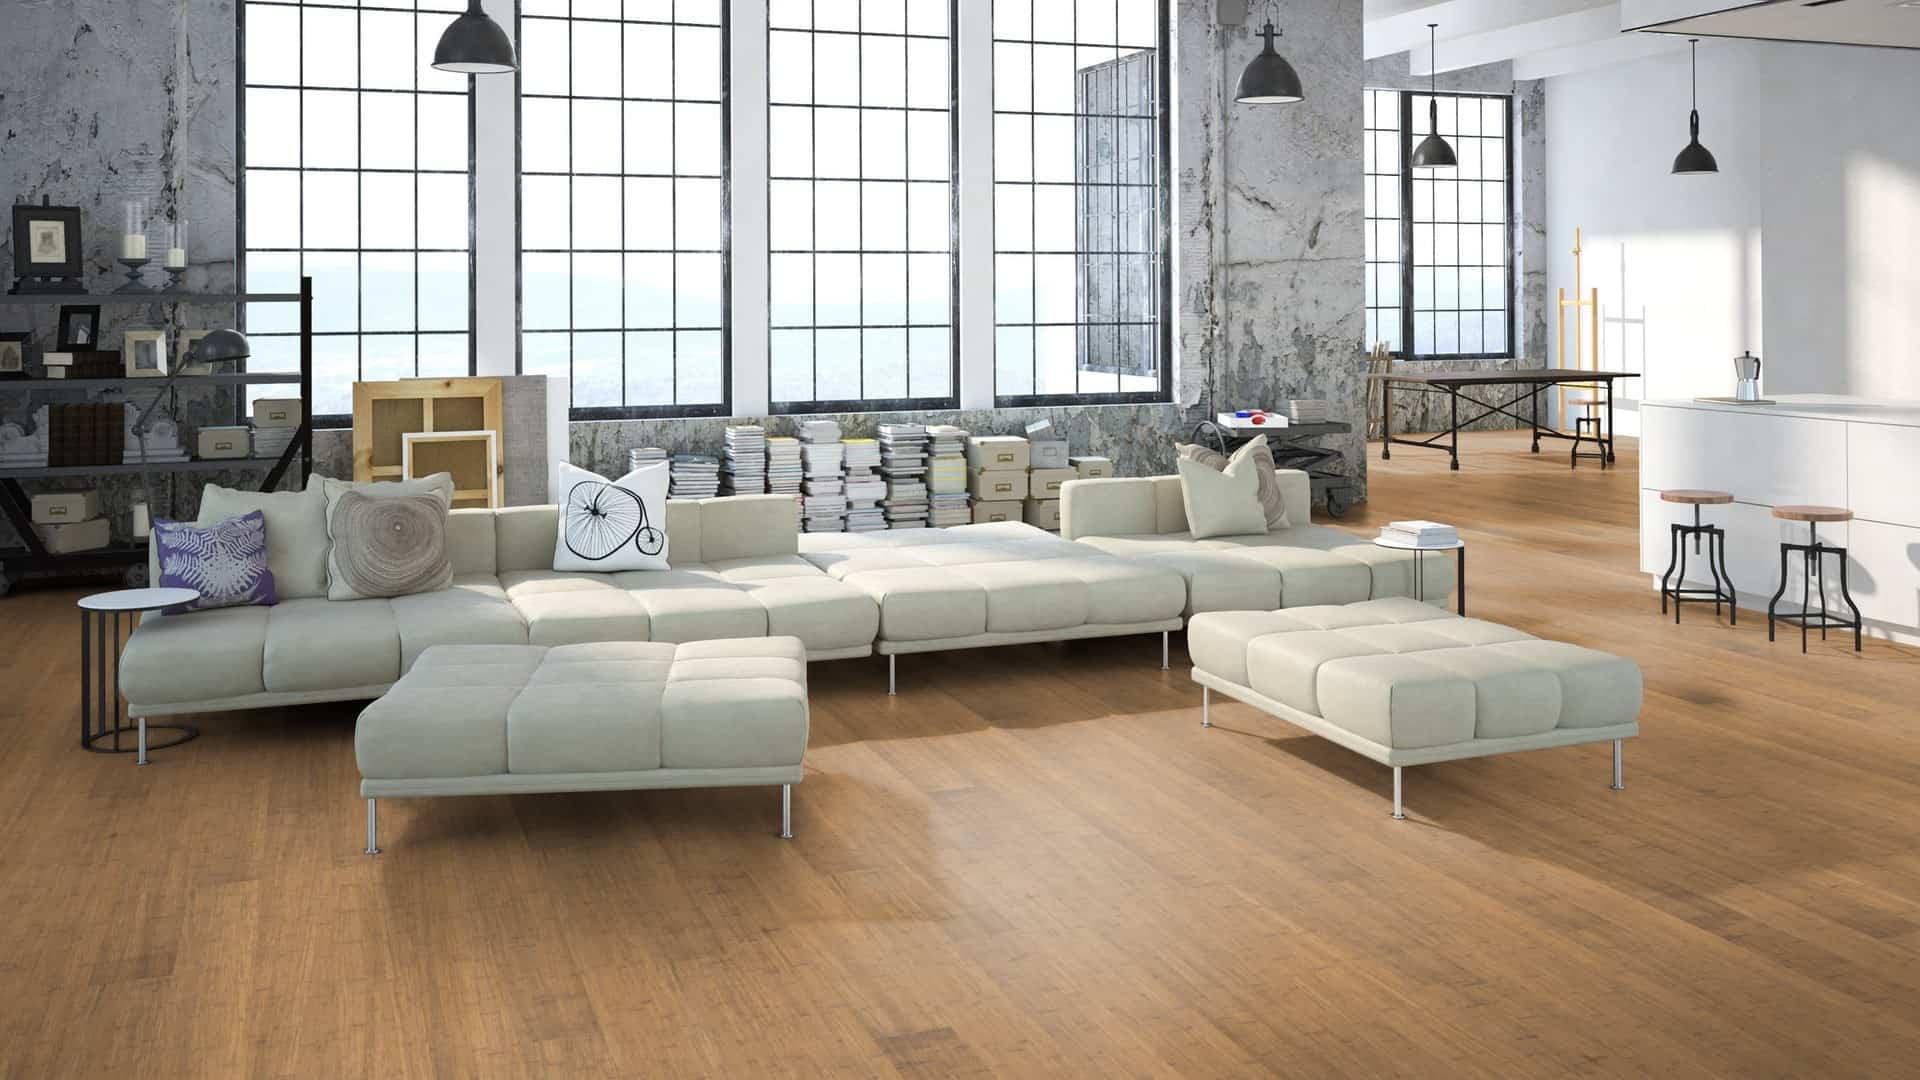 'bambuko grindys' or 'medinės grindys' or 'plaukiojančios grindys' or 'geros grindys' or grindų meistras' or 'interjero dizainas' or 'interjero dizainerė' or 'solida bambuko grindys'